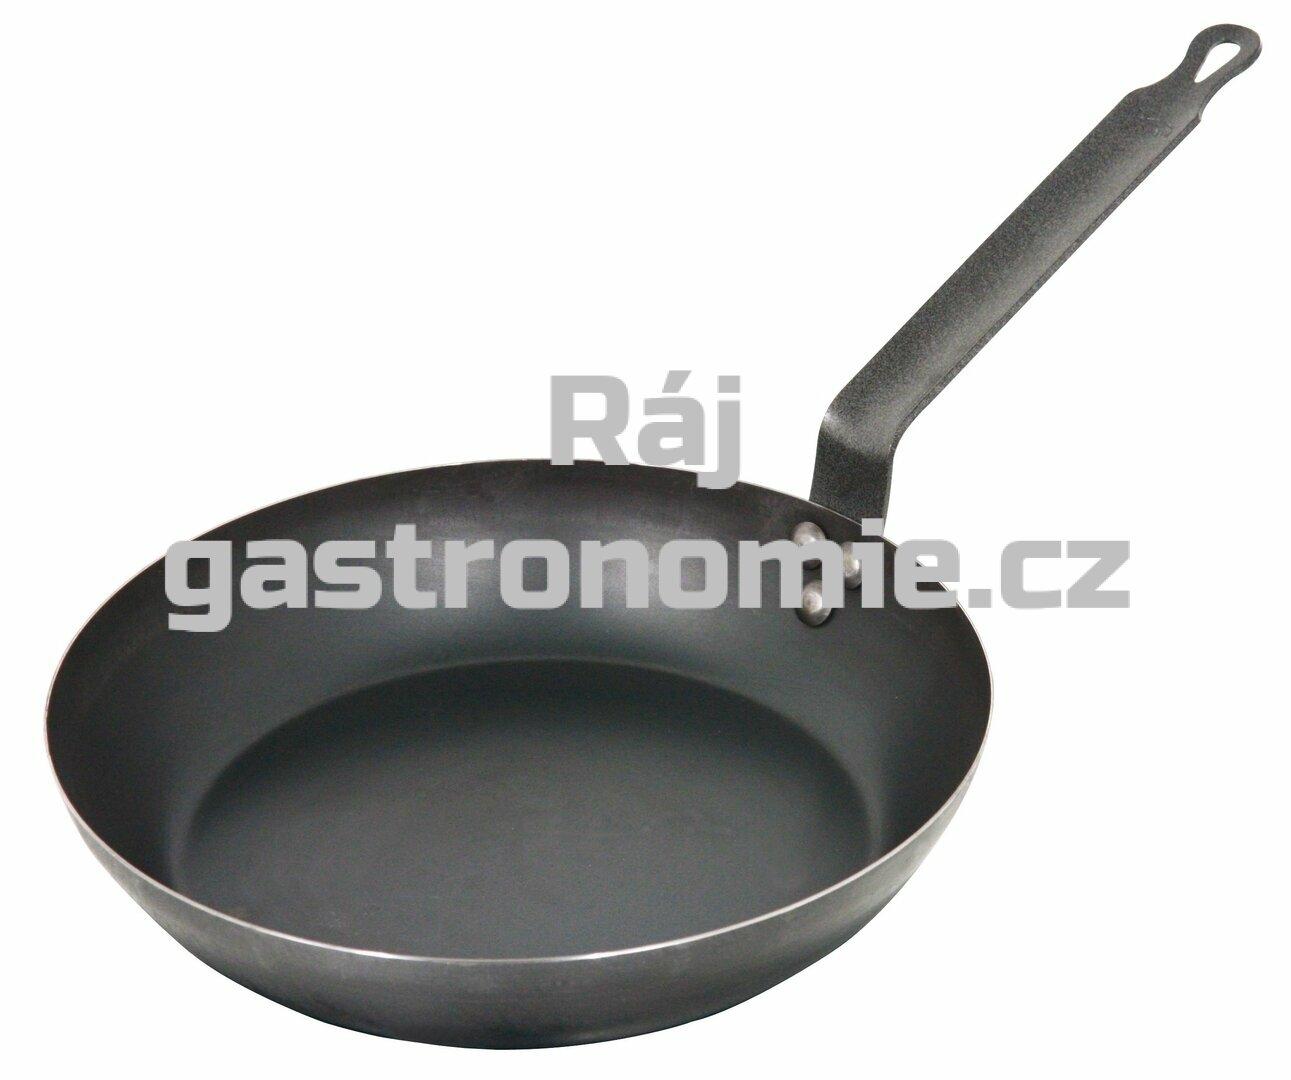 Pánev černá ocel Ø 32 cm